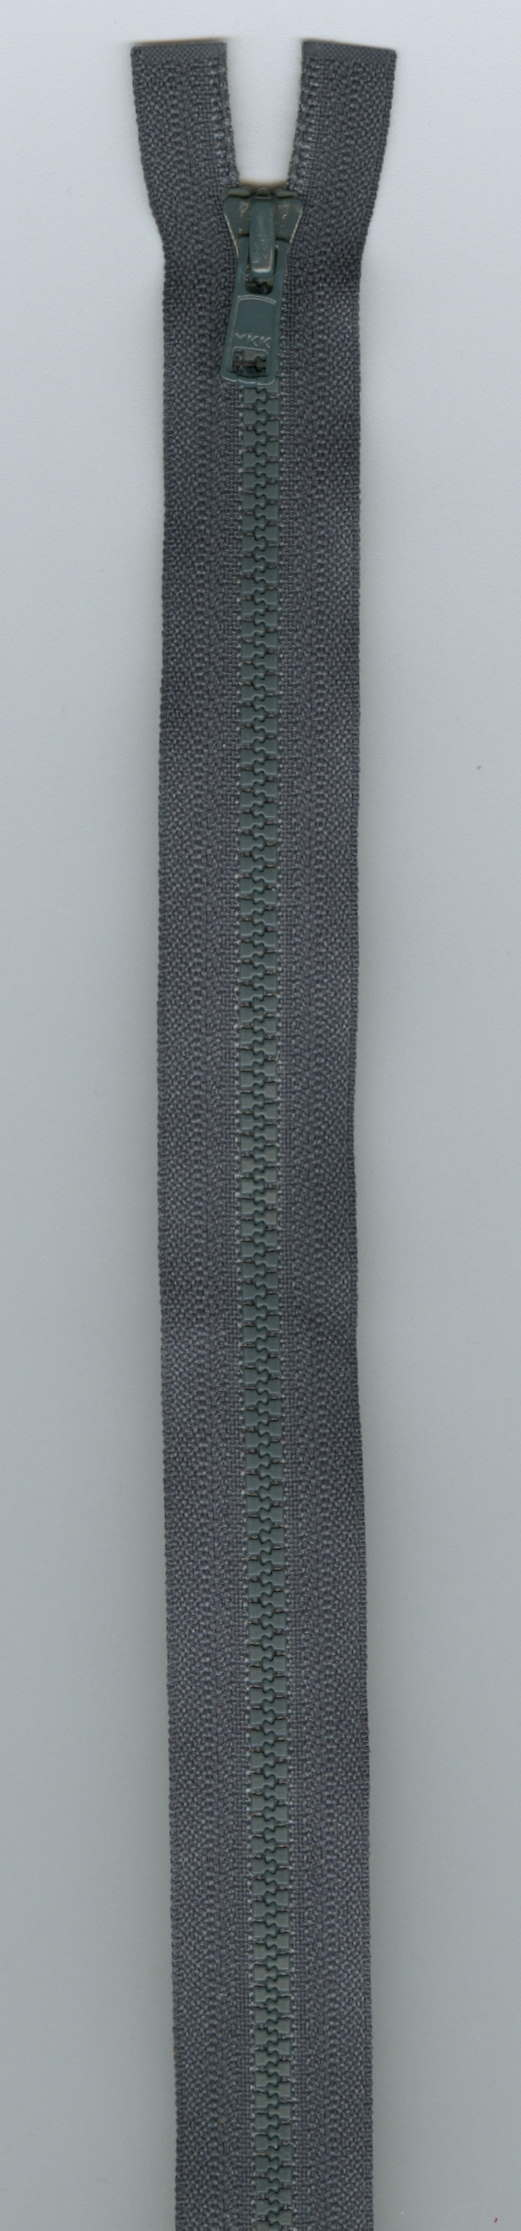 YKK Separating Zipper 14 - Charcoal - #3